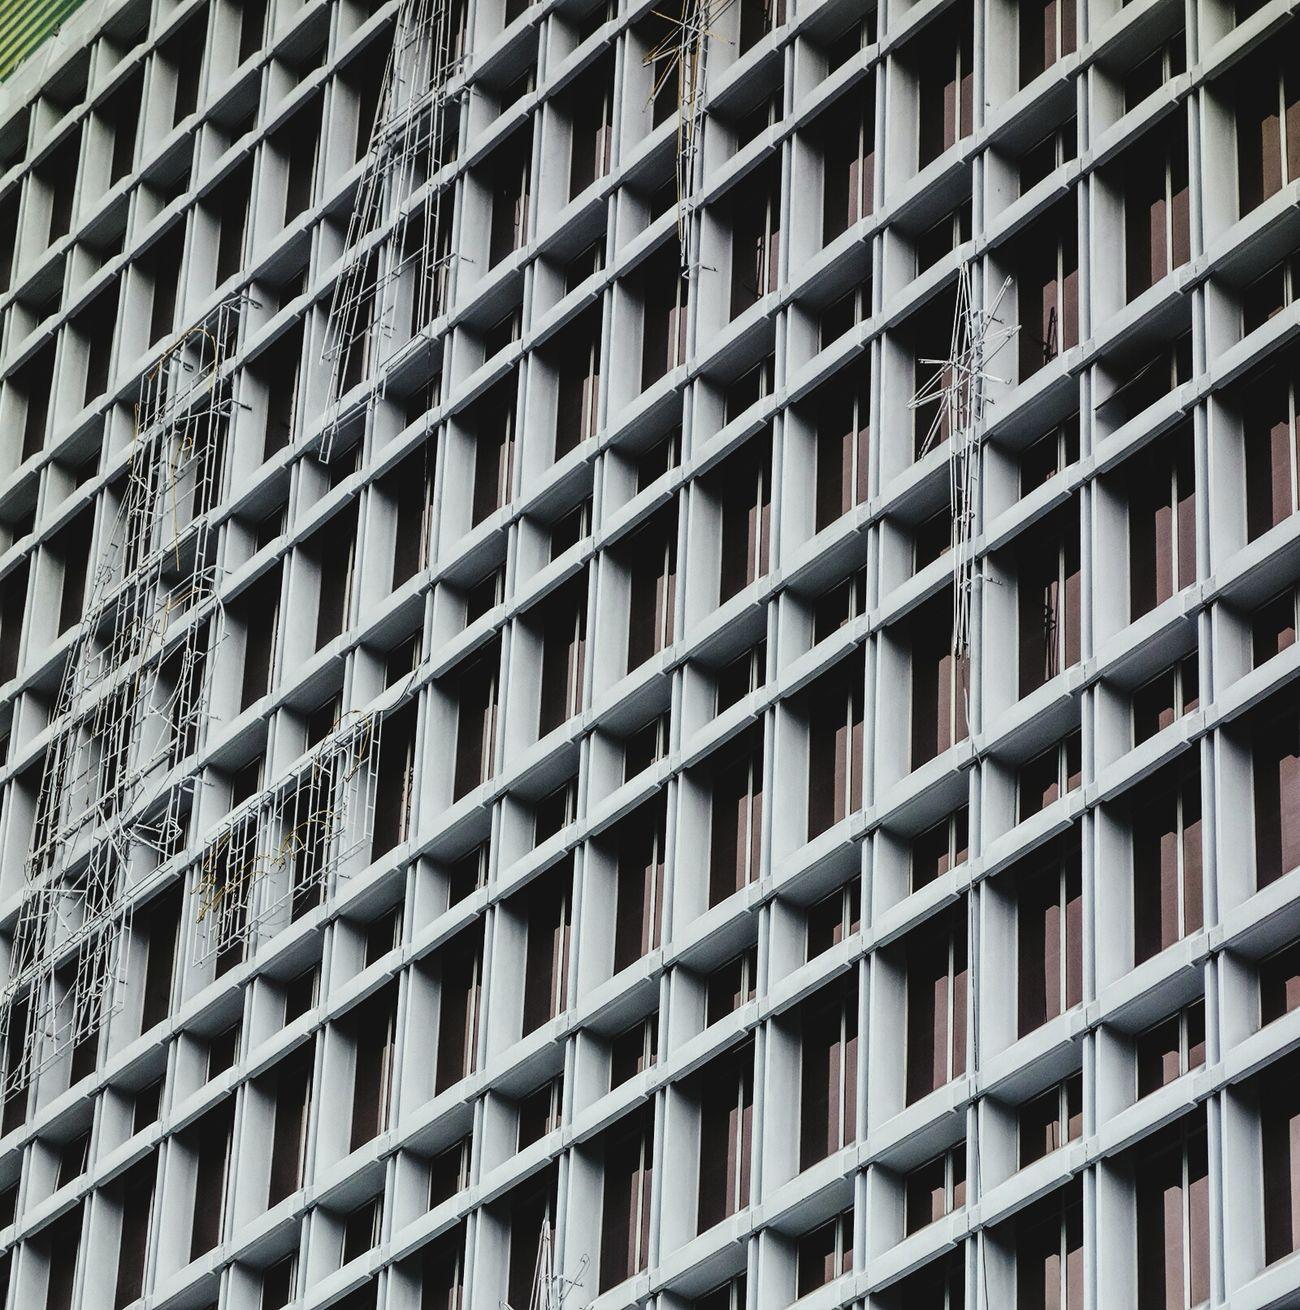 Ventana Ventanas Urban Urbanphotography Windows Window Fotografia Photography Rx100 Sonyrx100 Urban Landscape Urbanexploration PAISAJE URBANO Fotografía Urbana Costa Rica Costarica Sanjosecostarica San Jose, Costa Rica